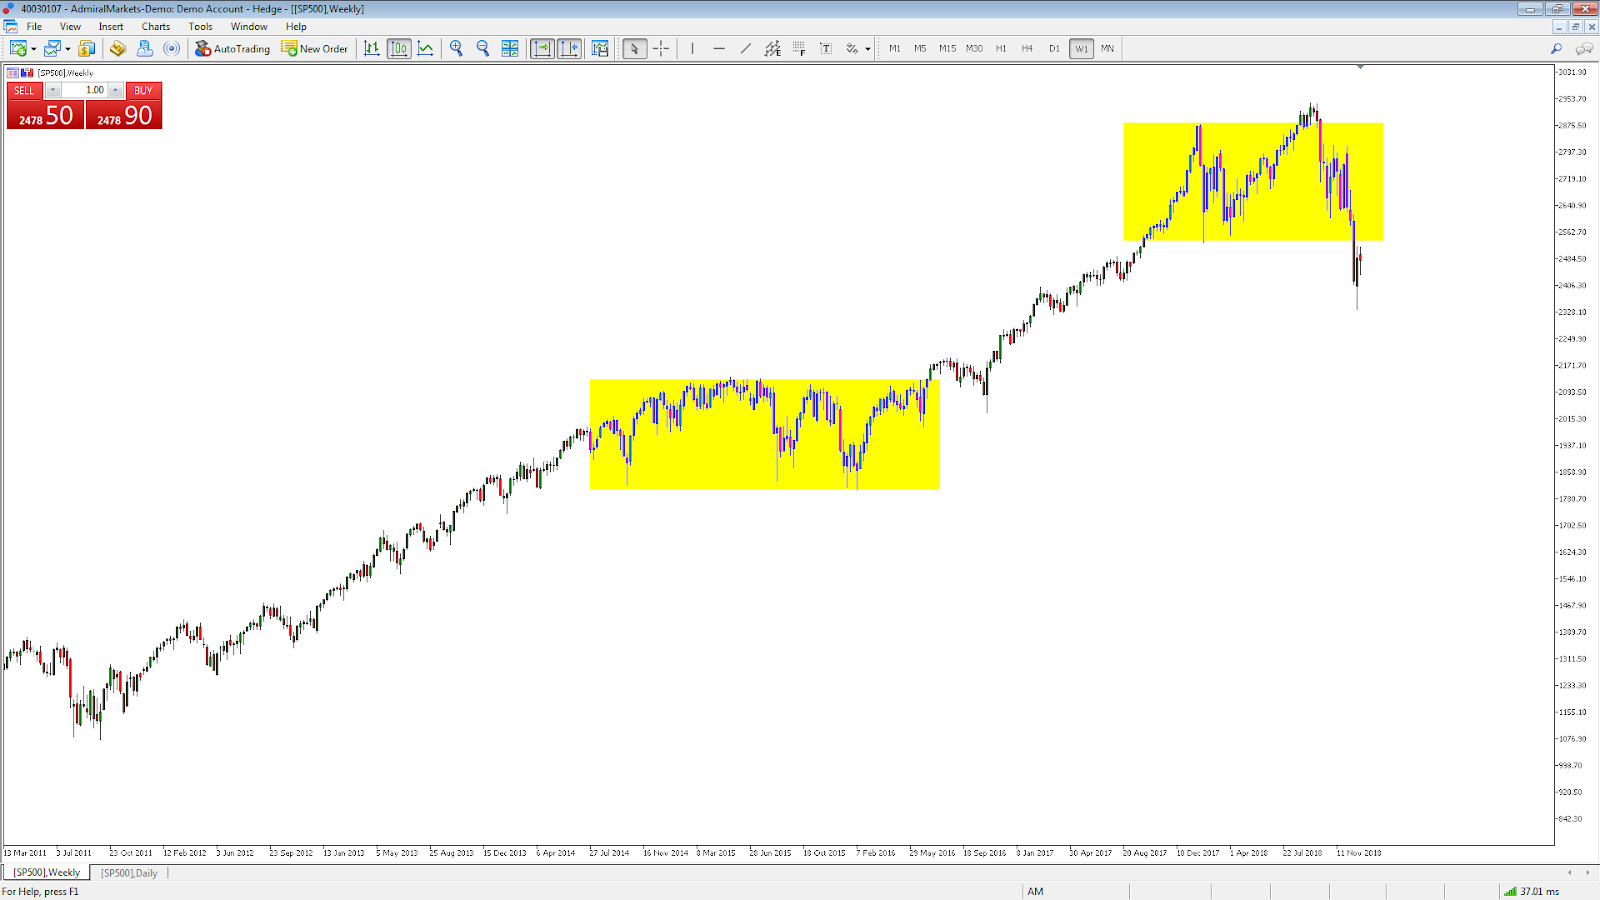 2019 stock market crash: SP500 volatility